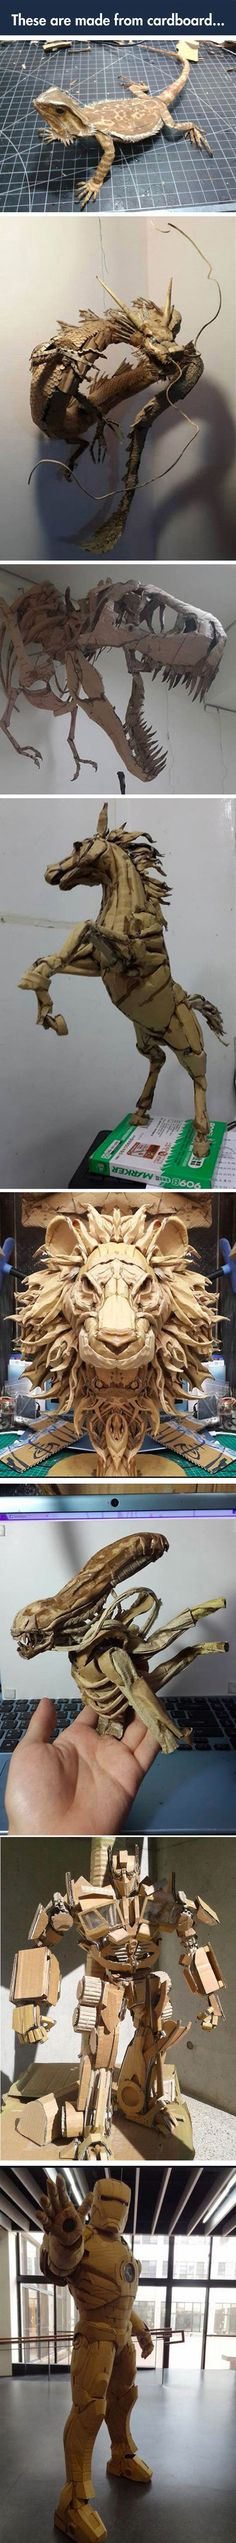 Incredible cardboard creatures.